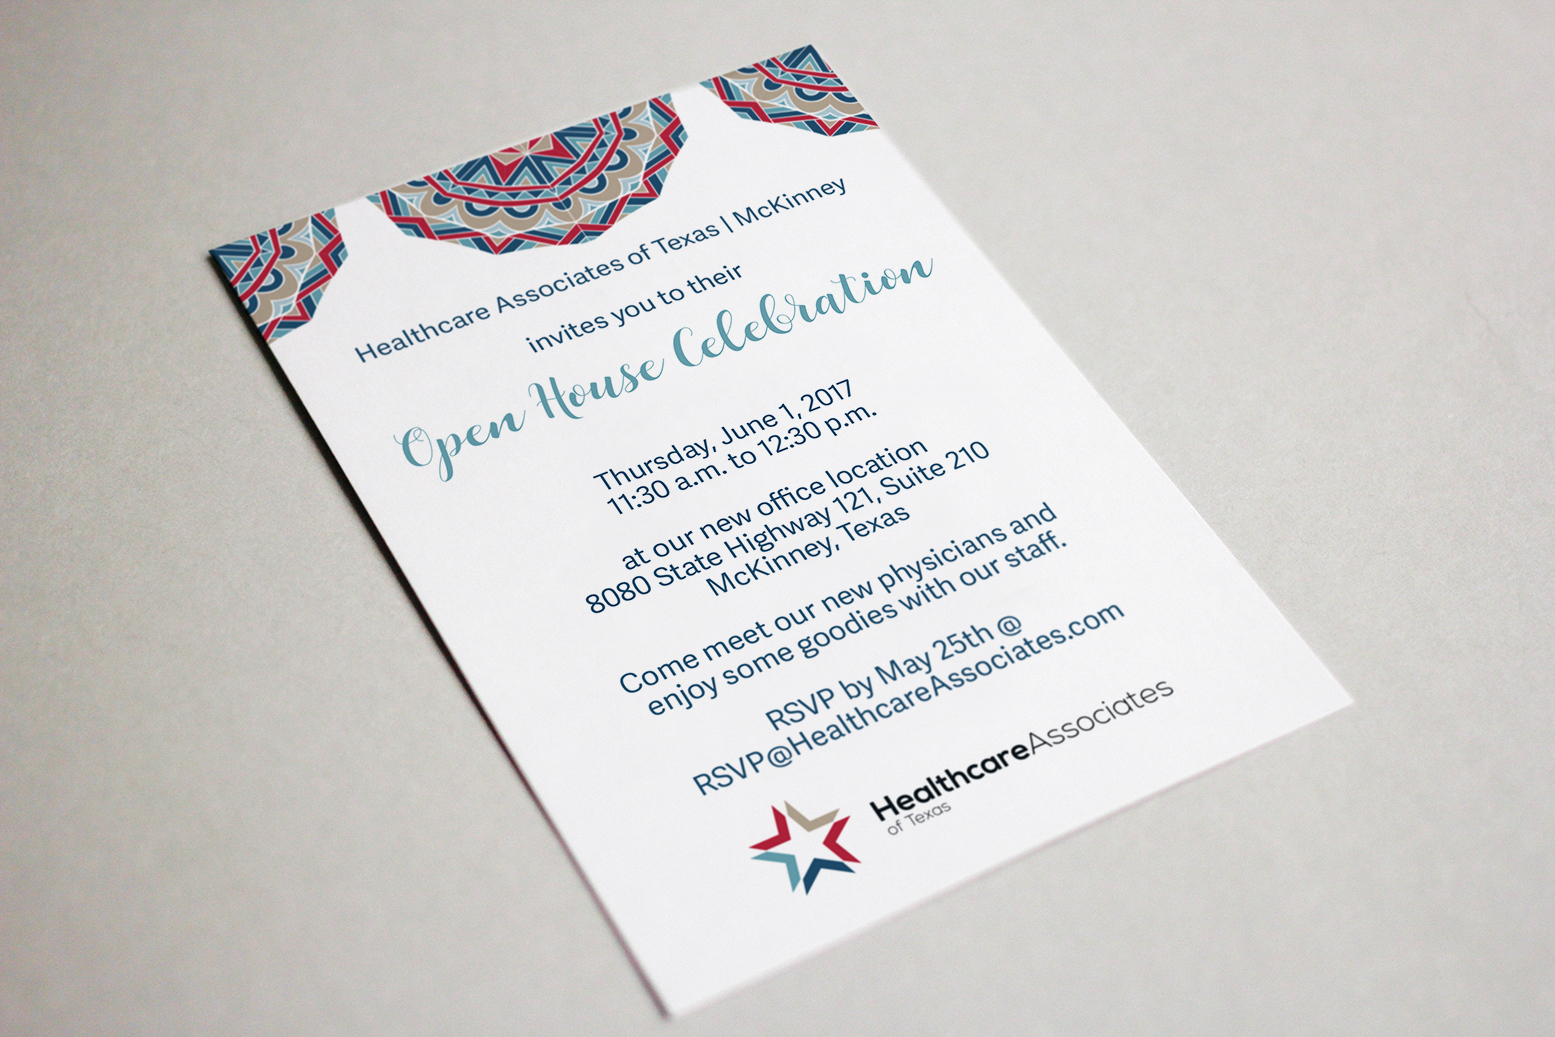 INVITATION l HCAT Open House